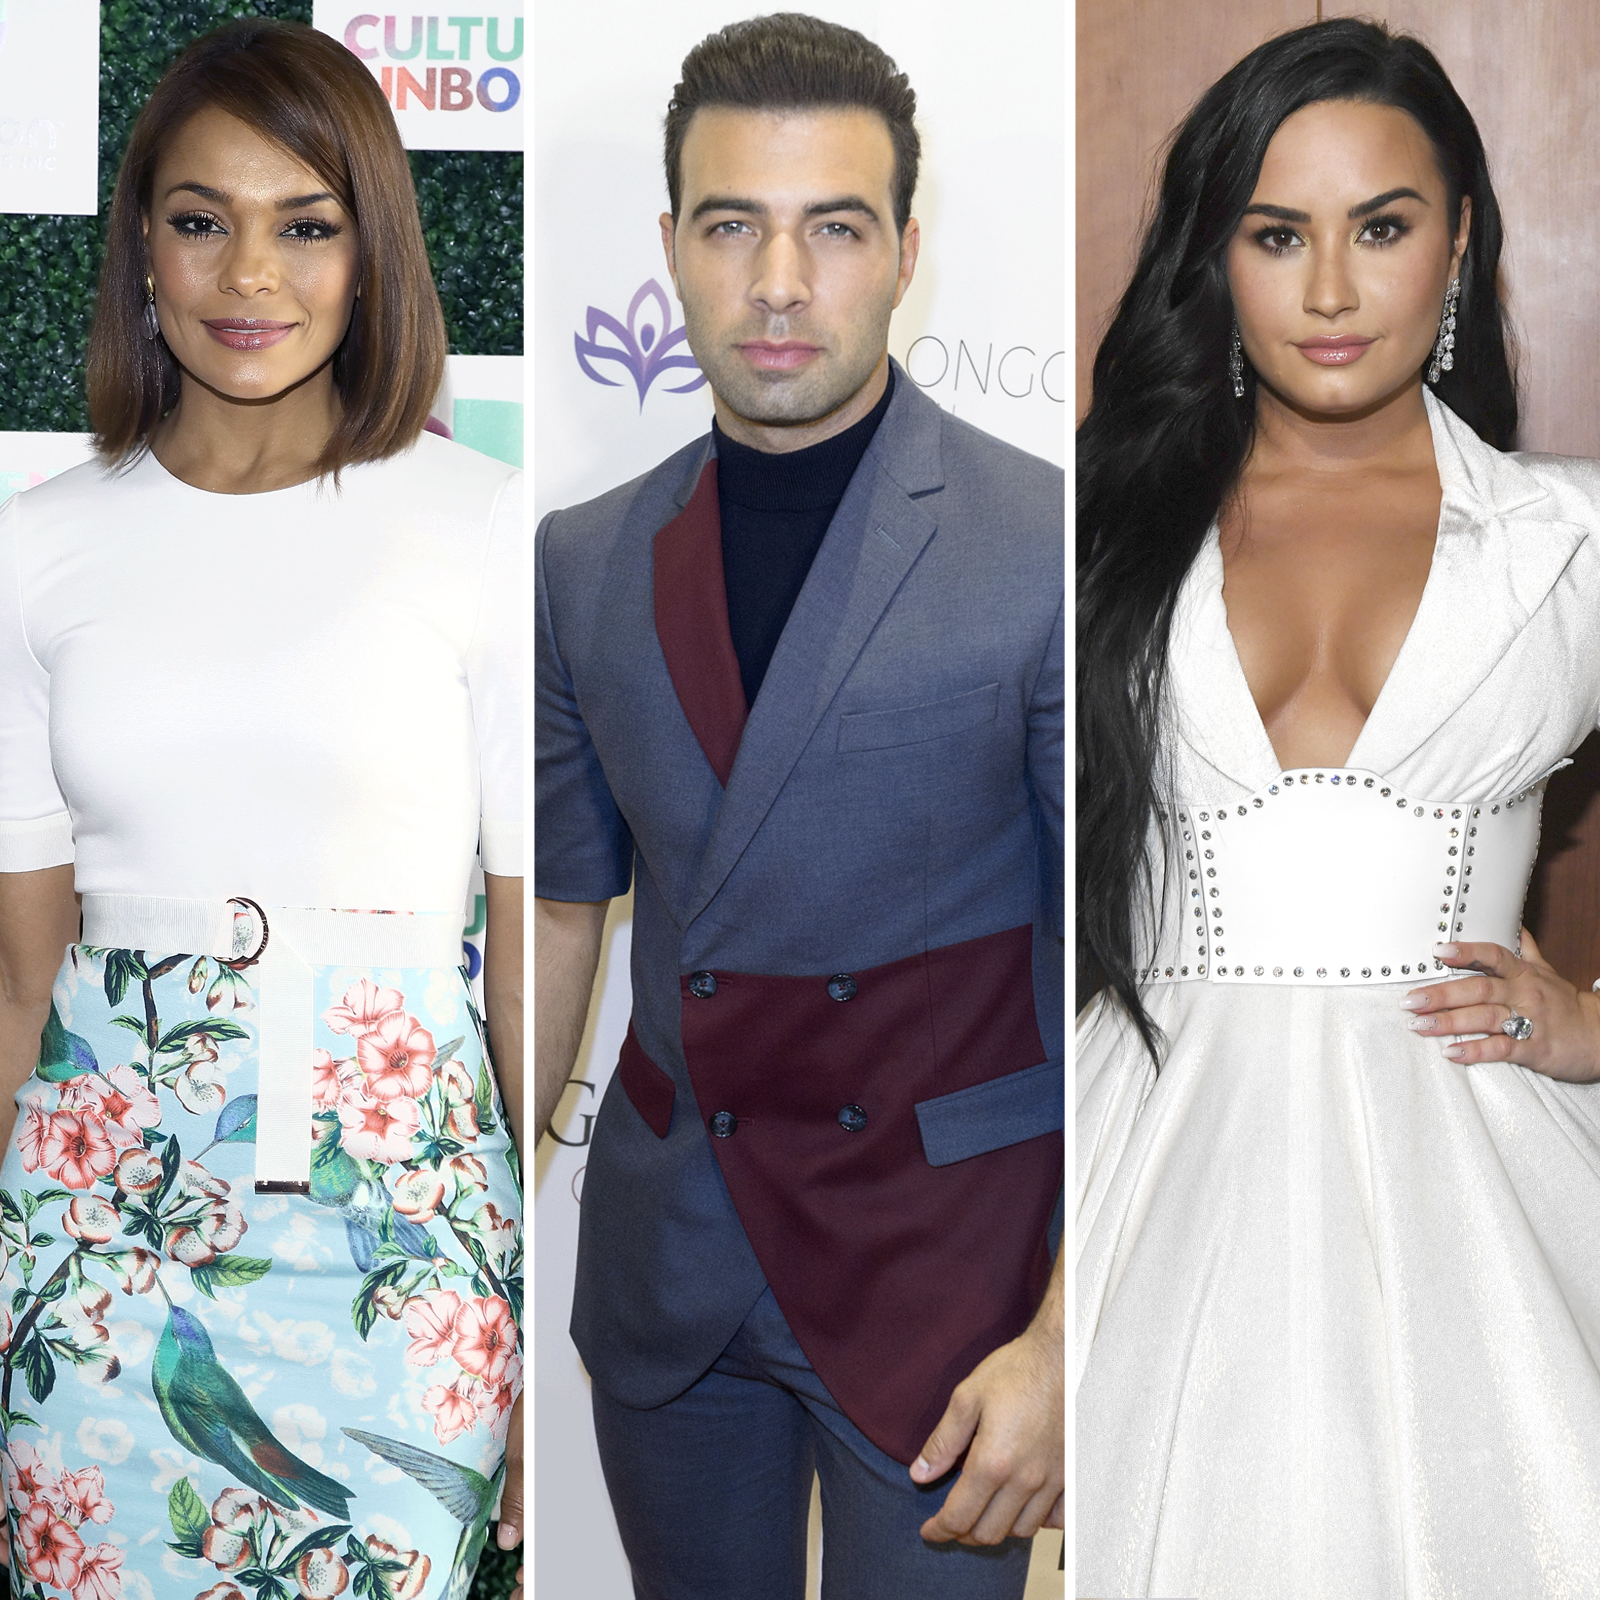 Ilia Calderon, Jencarlos Canela y Demi Lovato